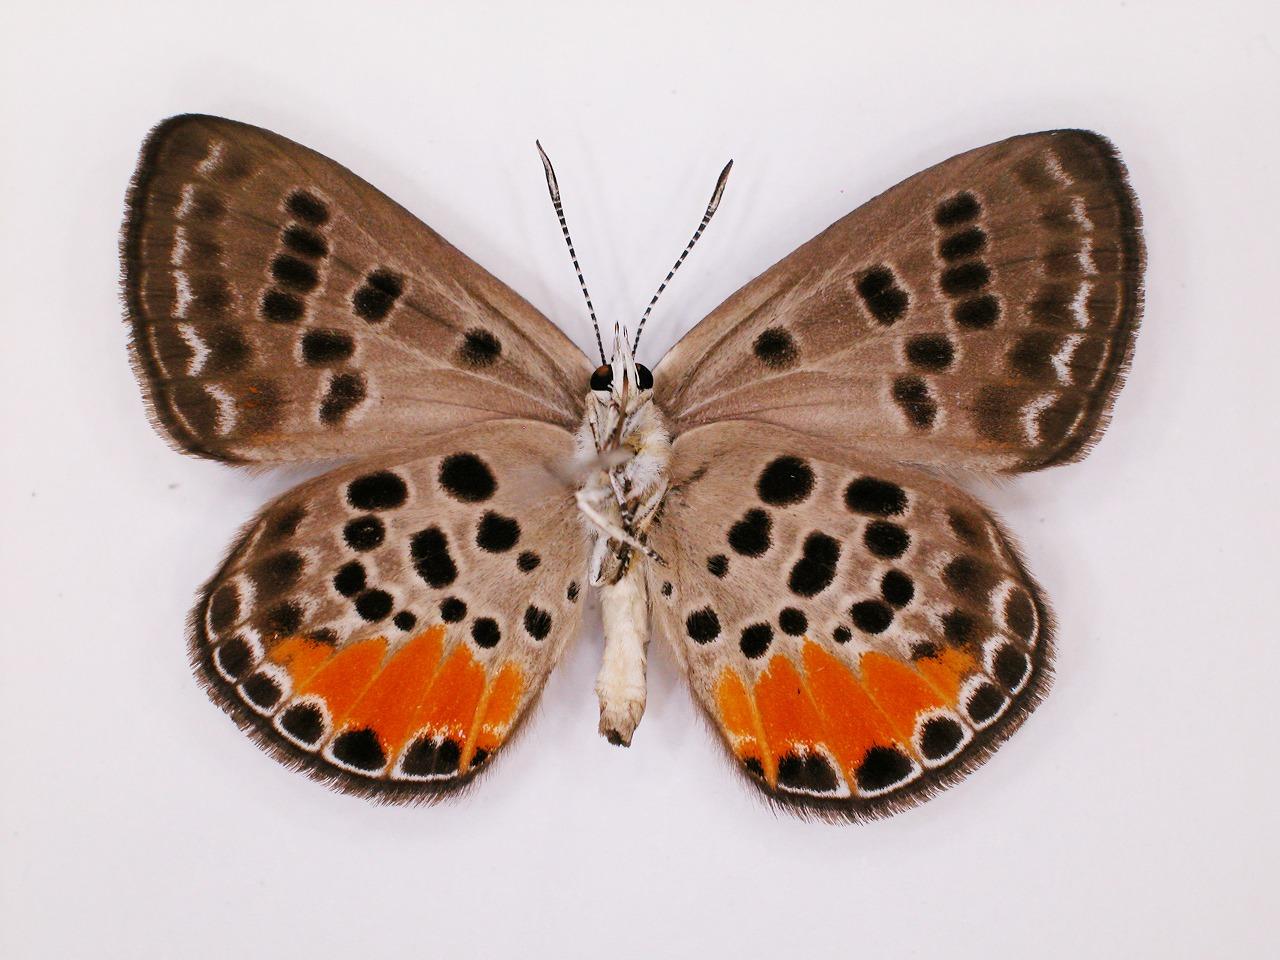 https://www.hitohaku.jp/material/l-material/butterfly-wing/5-lycaenidae/B1-272323_B.jpg